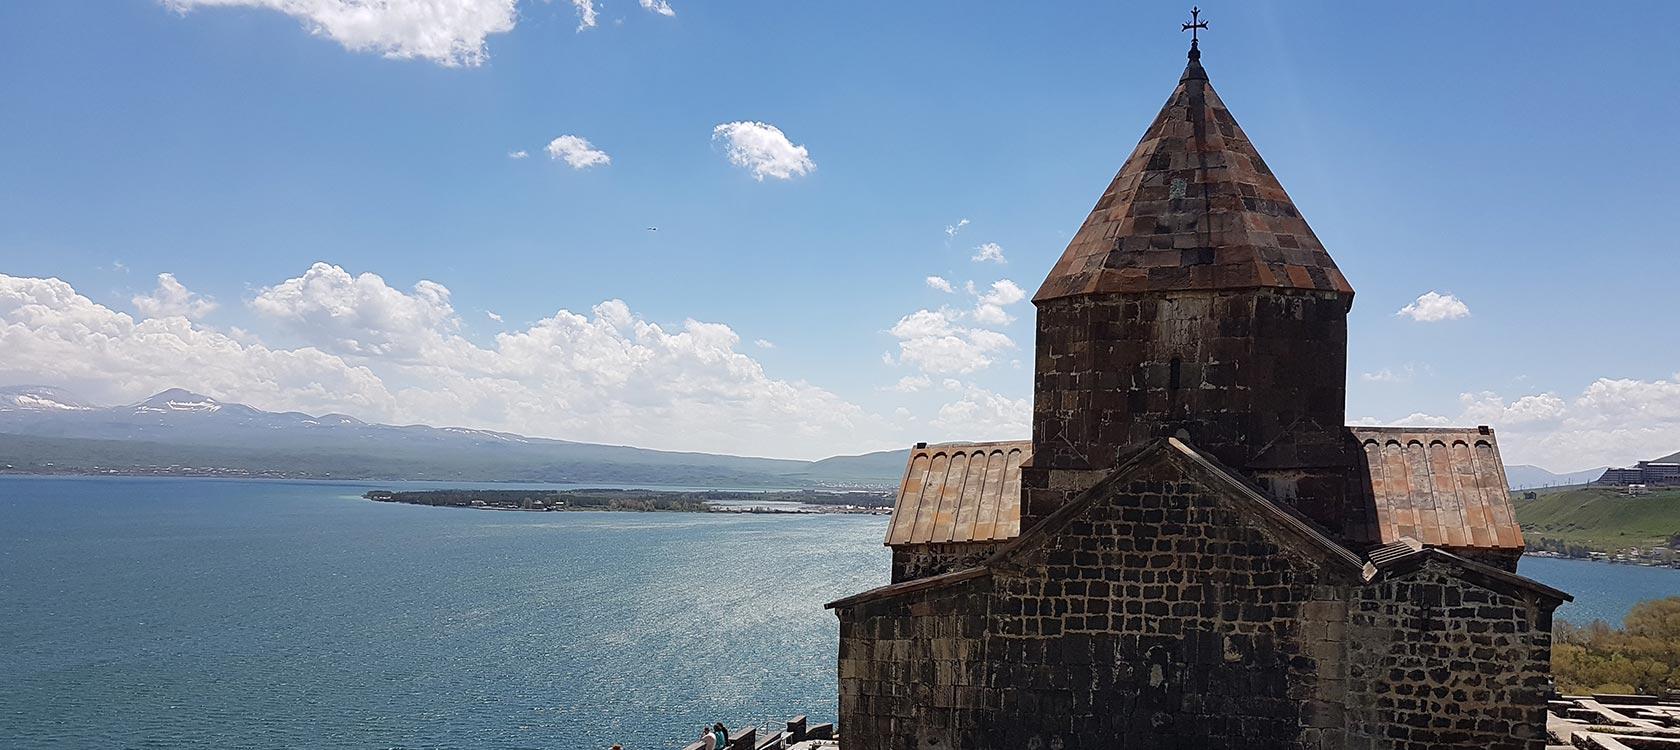 Monastère de Sevan, Arménie, l'action de l'AFD en Arménie